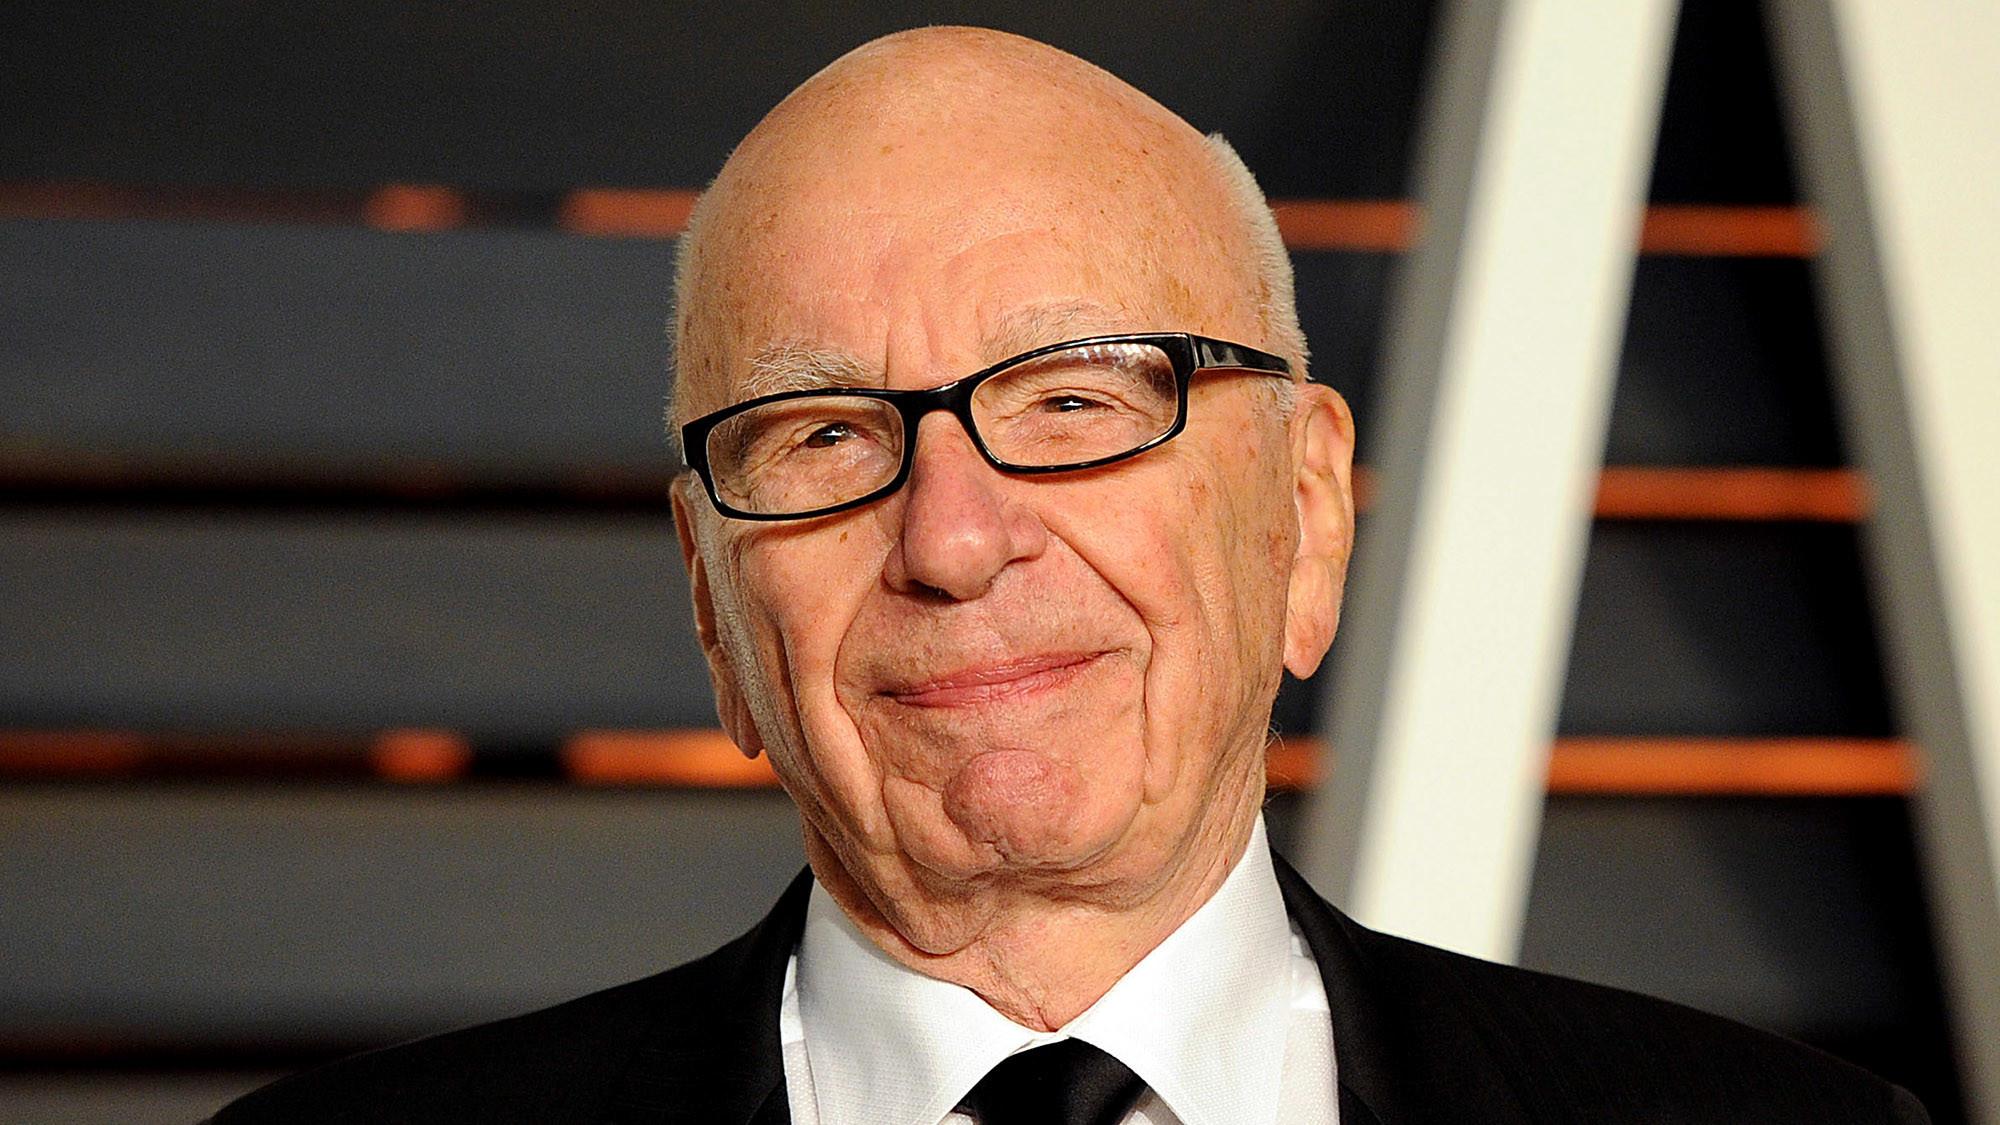 Rupert Murdoch, executive chairman of 21st Century Fox The brash billionaire who built a media empire